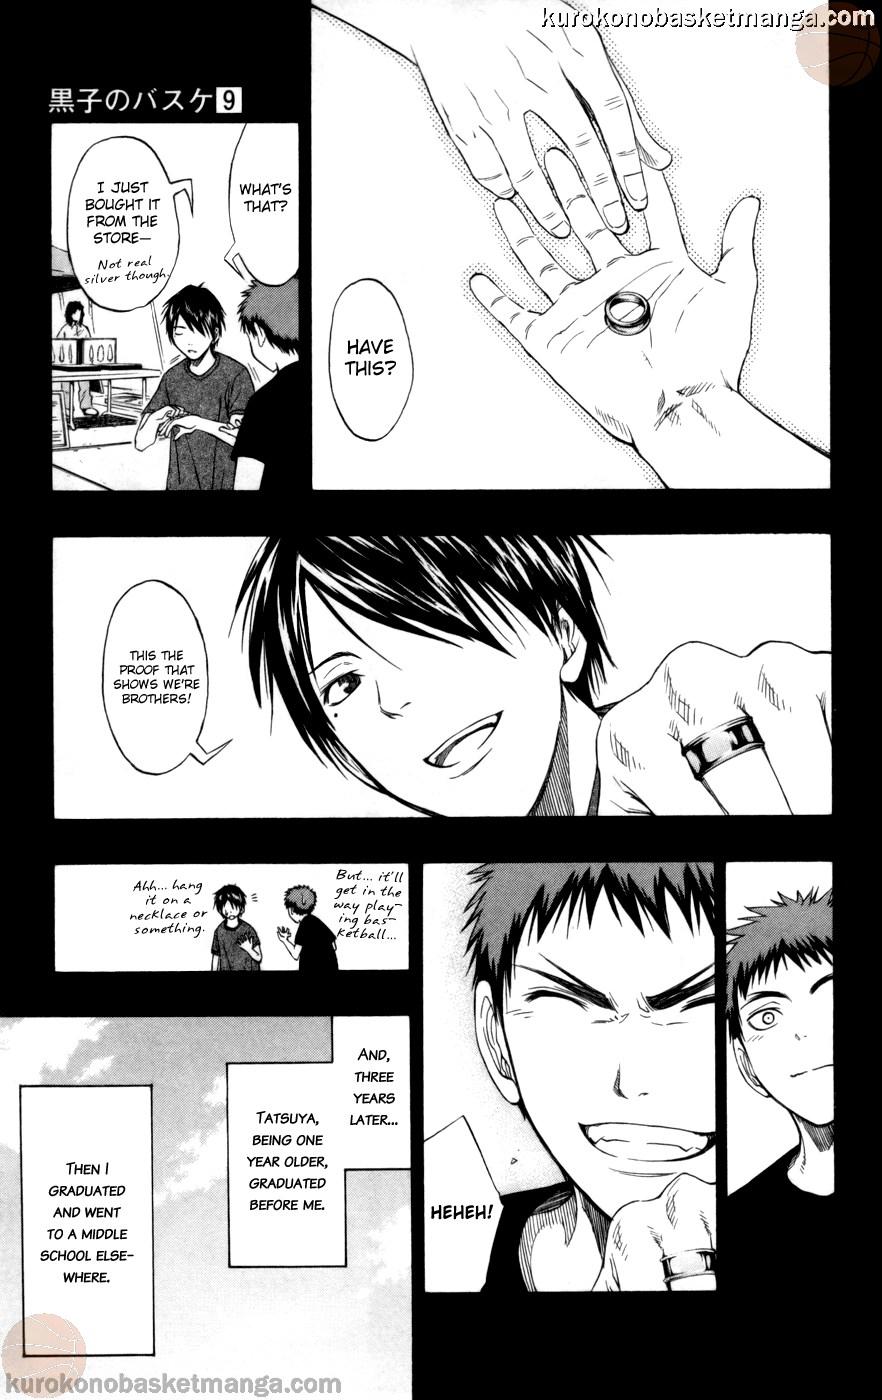 Kuroko no Basket Manga Chapter 76 - Image 09